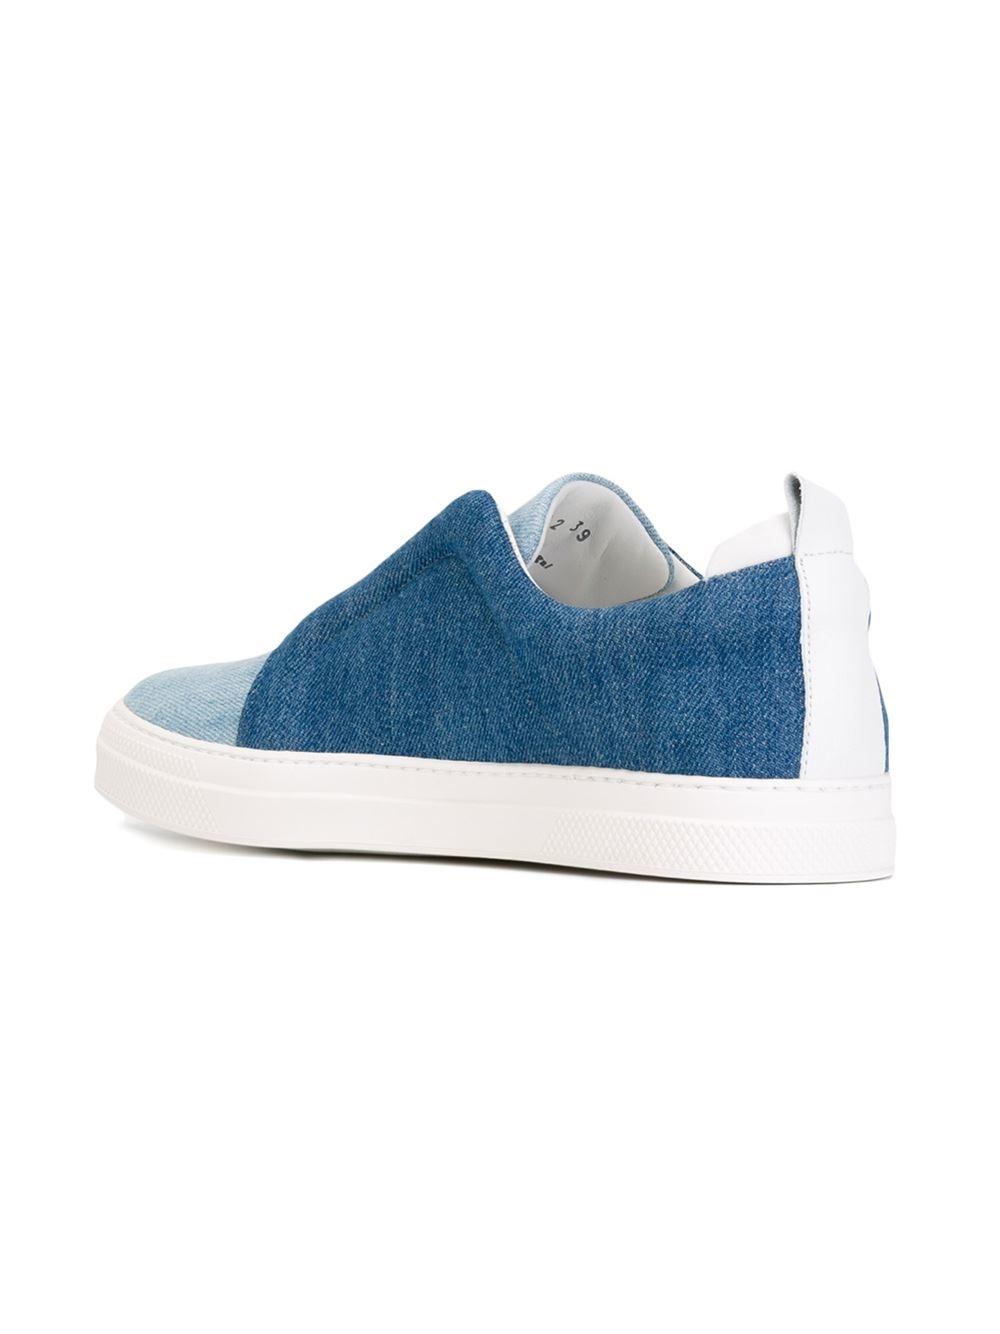 pierre hardy 39 basket 39 slip on sneakers in blue lyst. Black Bedroom Furniture Sets. Home Design Ideas